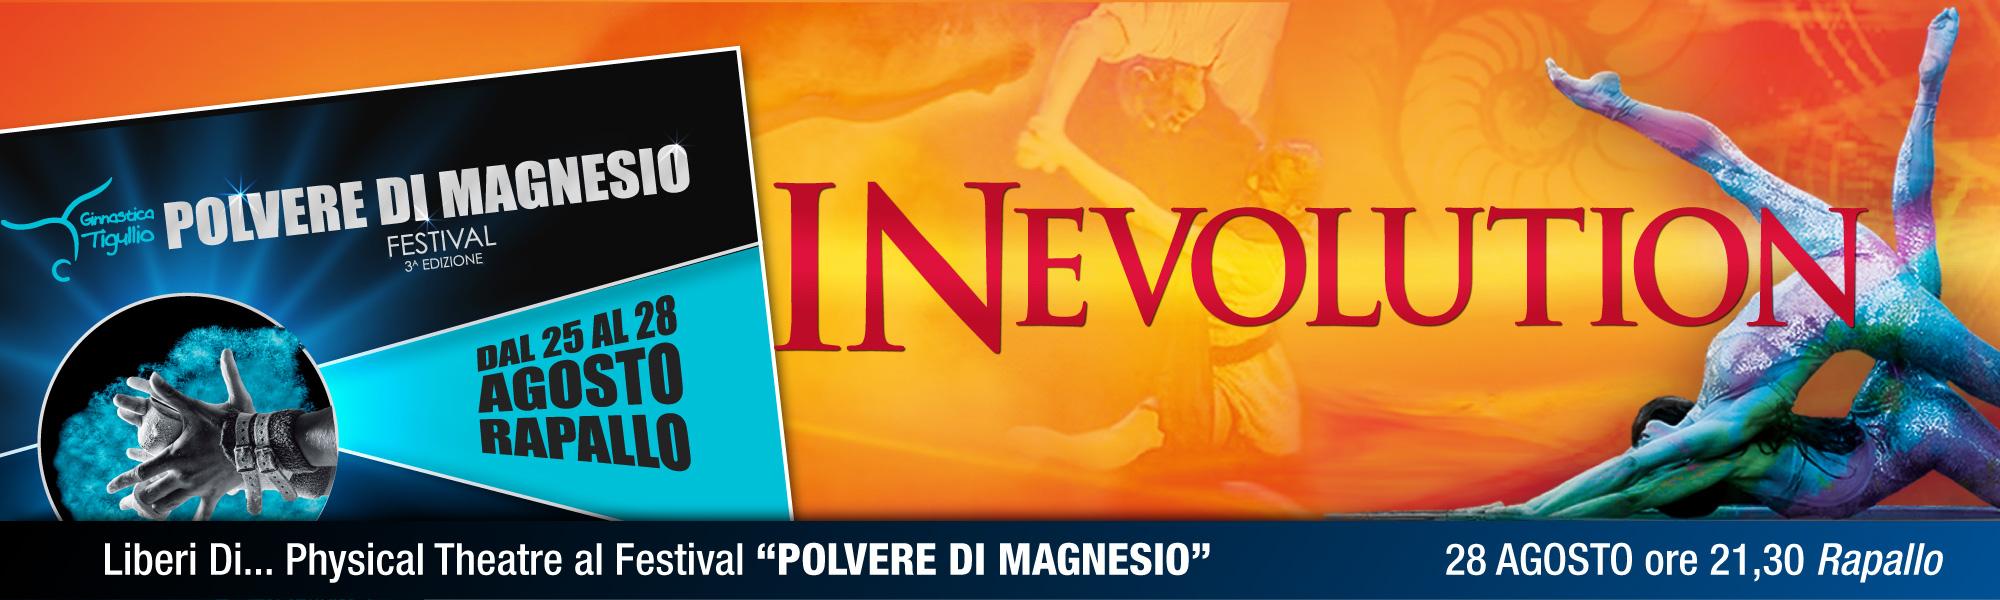 news_inevolution_rapallo-1